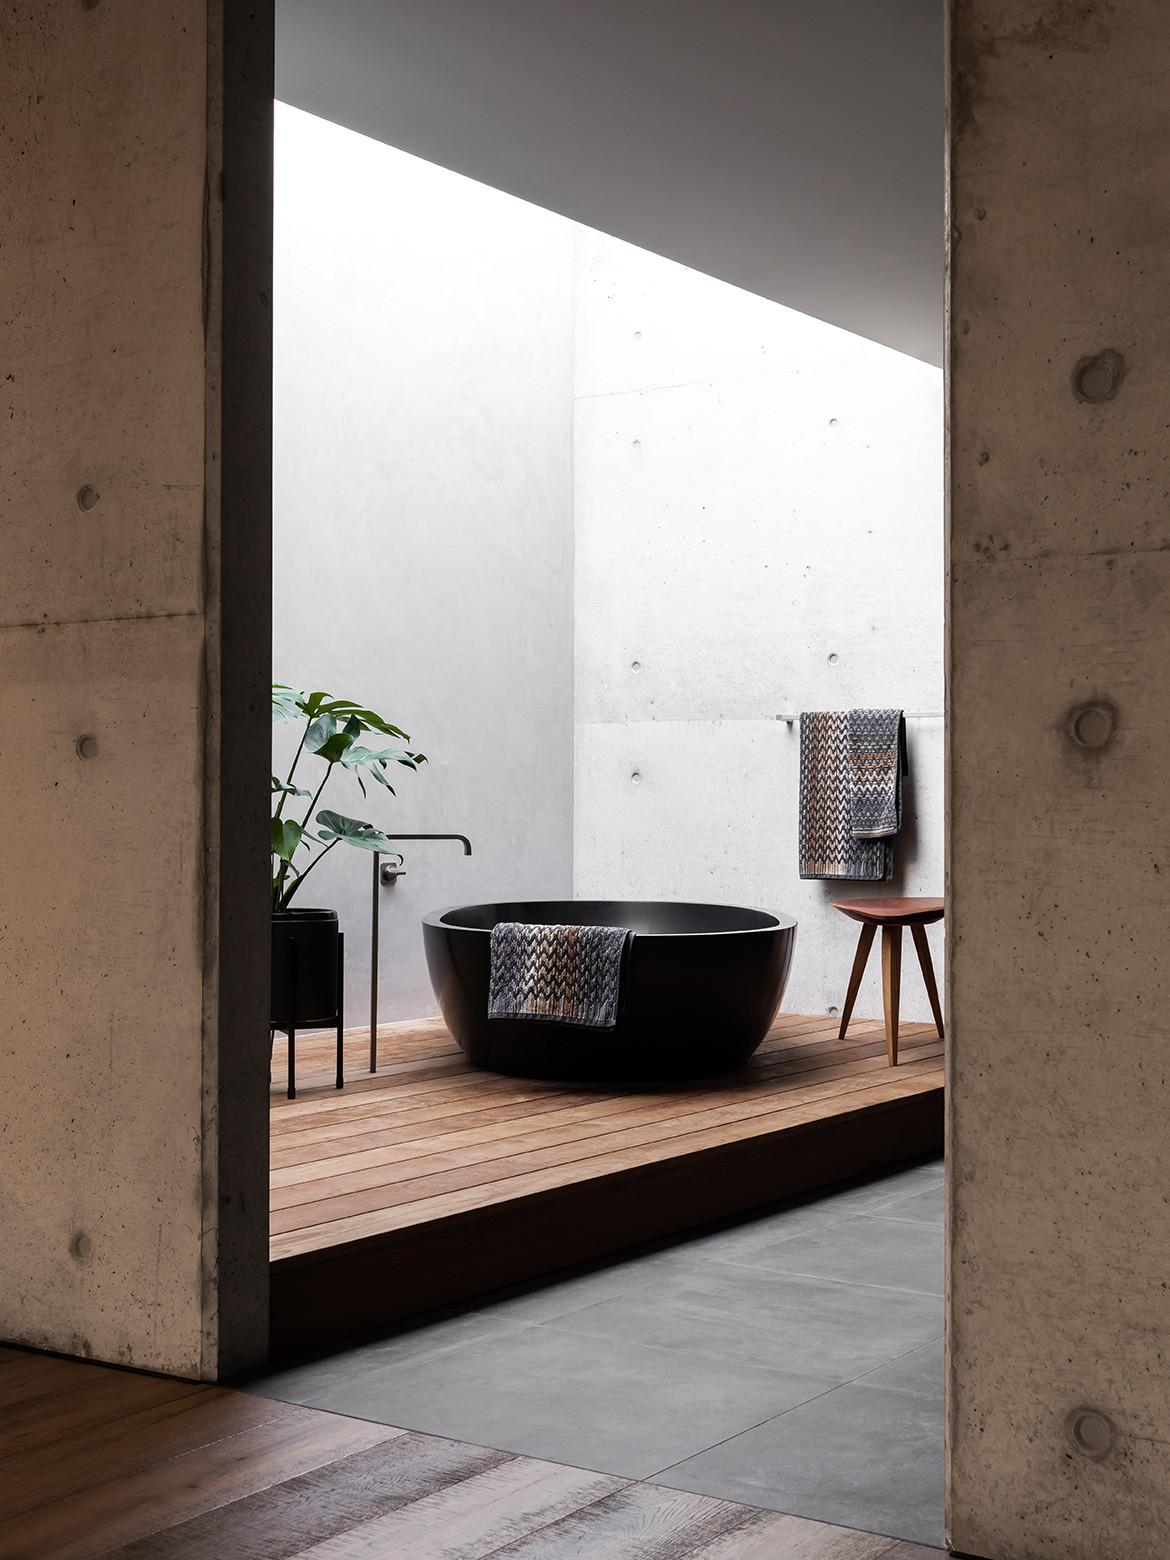 Vodka Palace by Marcus Browne Architect | interior architecture | contemporary interior design | bathroom design | concrete render | brutalist design